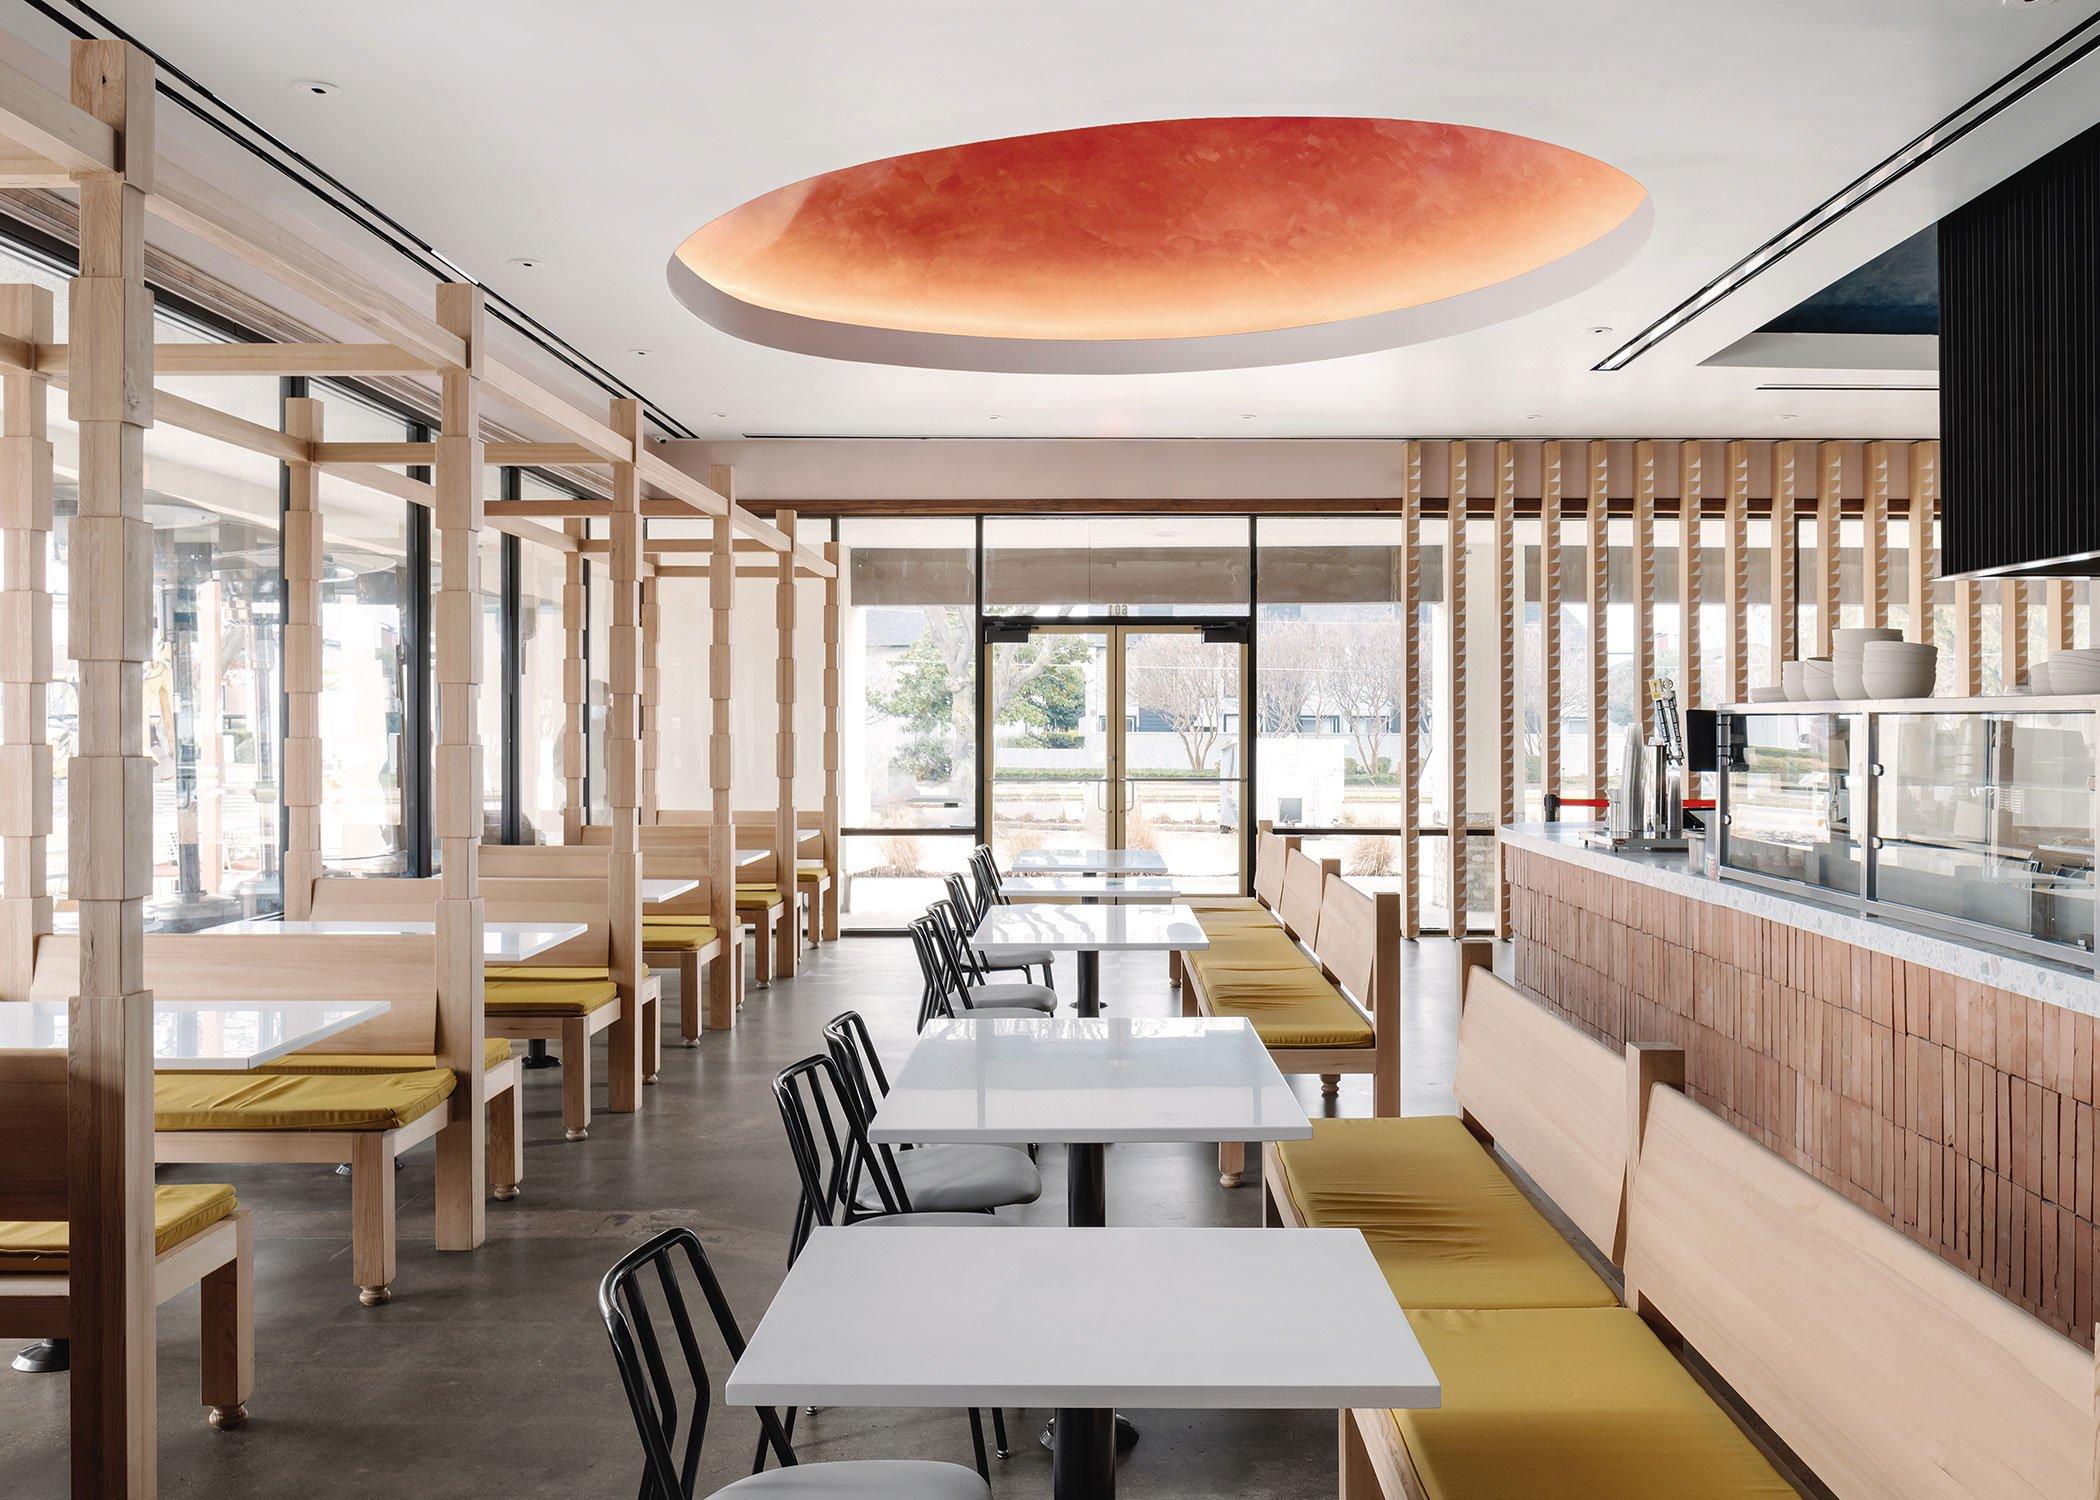 Leo-Chairs-in-Lada_Resaurant_Design_Inspiration